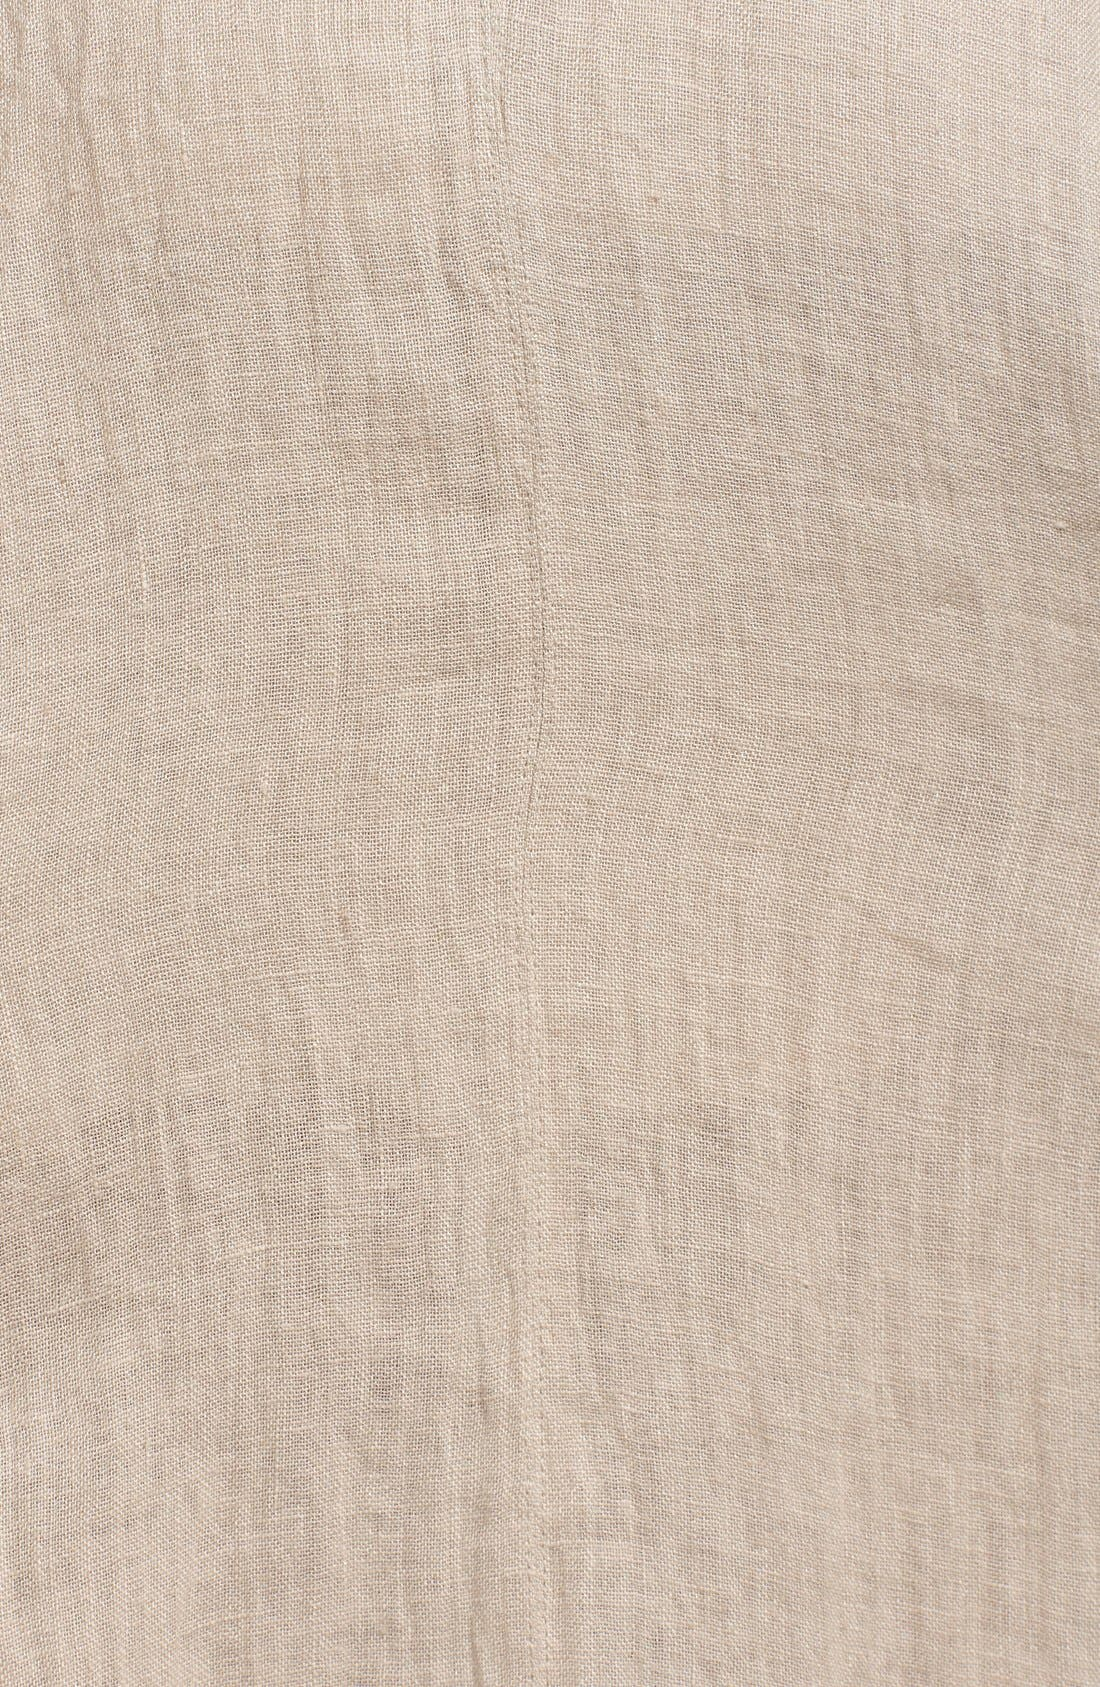 Alternate Image 5  - Elie Tahari 'Florence' High/Low Linen Skirt